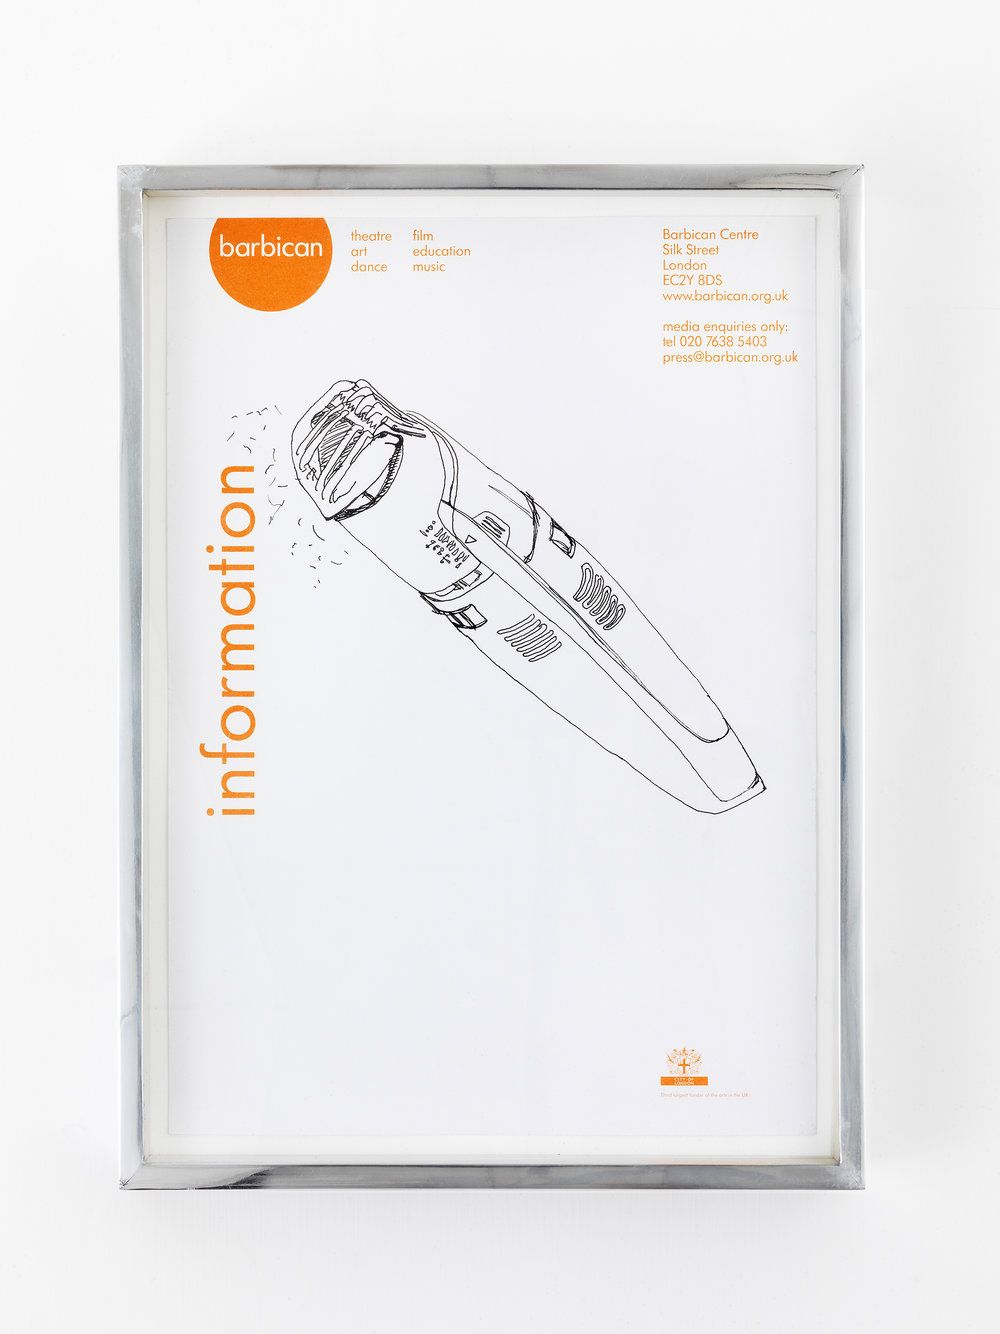 Philips Norelco TR980 Turbo Vacuum Trimmer (broken), Great Arthur House, #44, Fann Street, Golden Lane Estate, London, EC1, September 17, 2014   2014  Ink on paper  10 x 12 1/2 inches